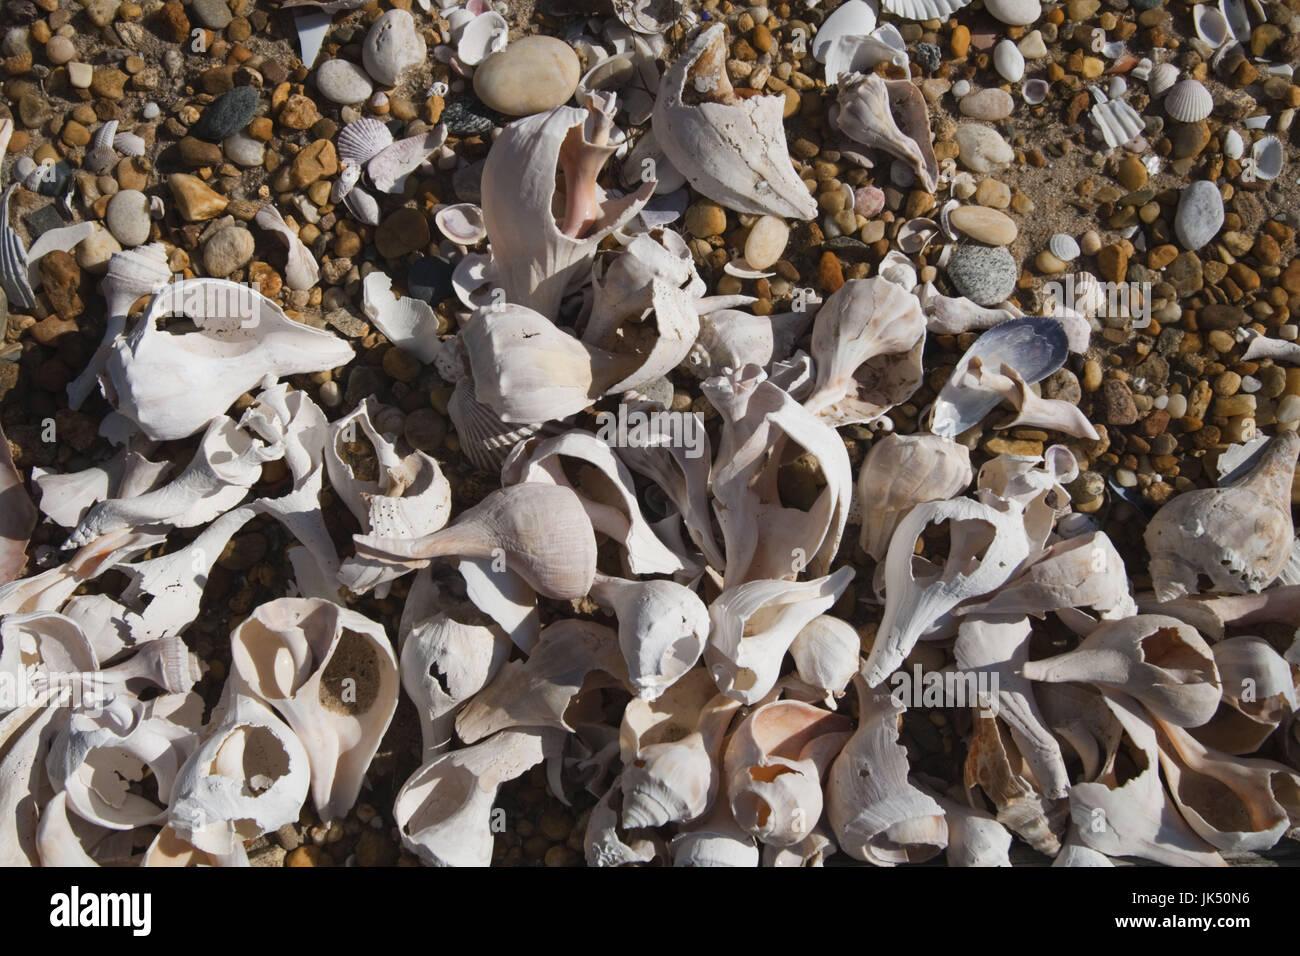 USA, New York, Long Island, The Hamptons, Amagansett, beach shells - Stock Image